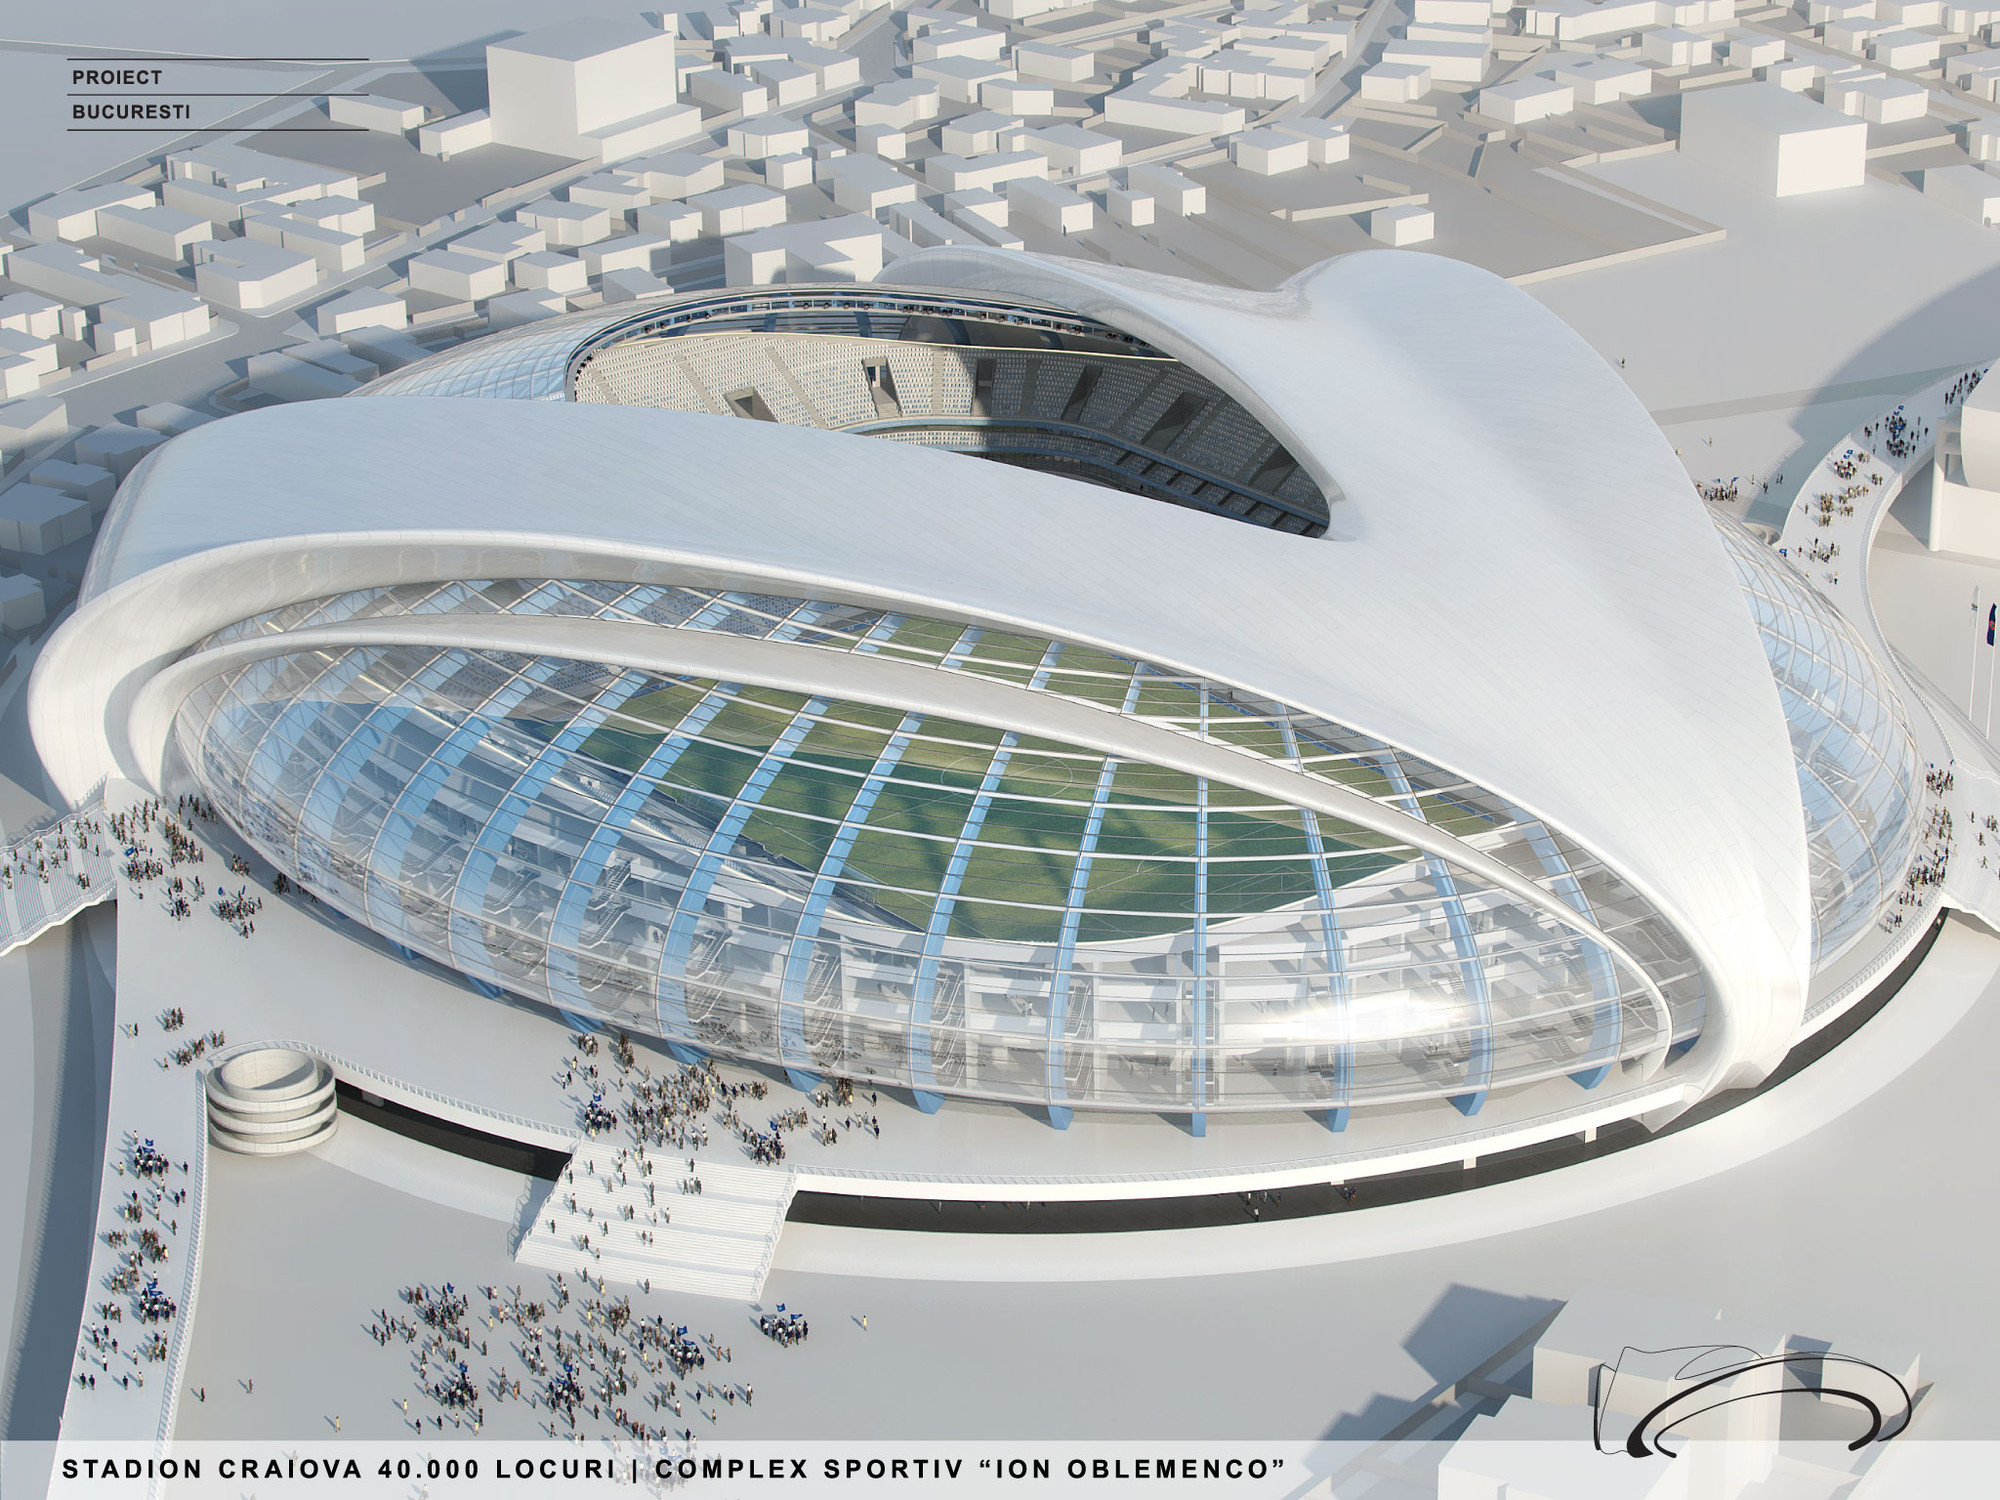 Craiova Football Stadium Proposal / Proiect Bucuresti, Courtesy of Proiect Bucuresti